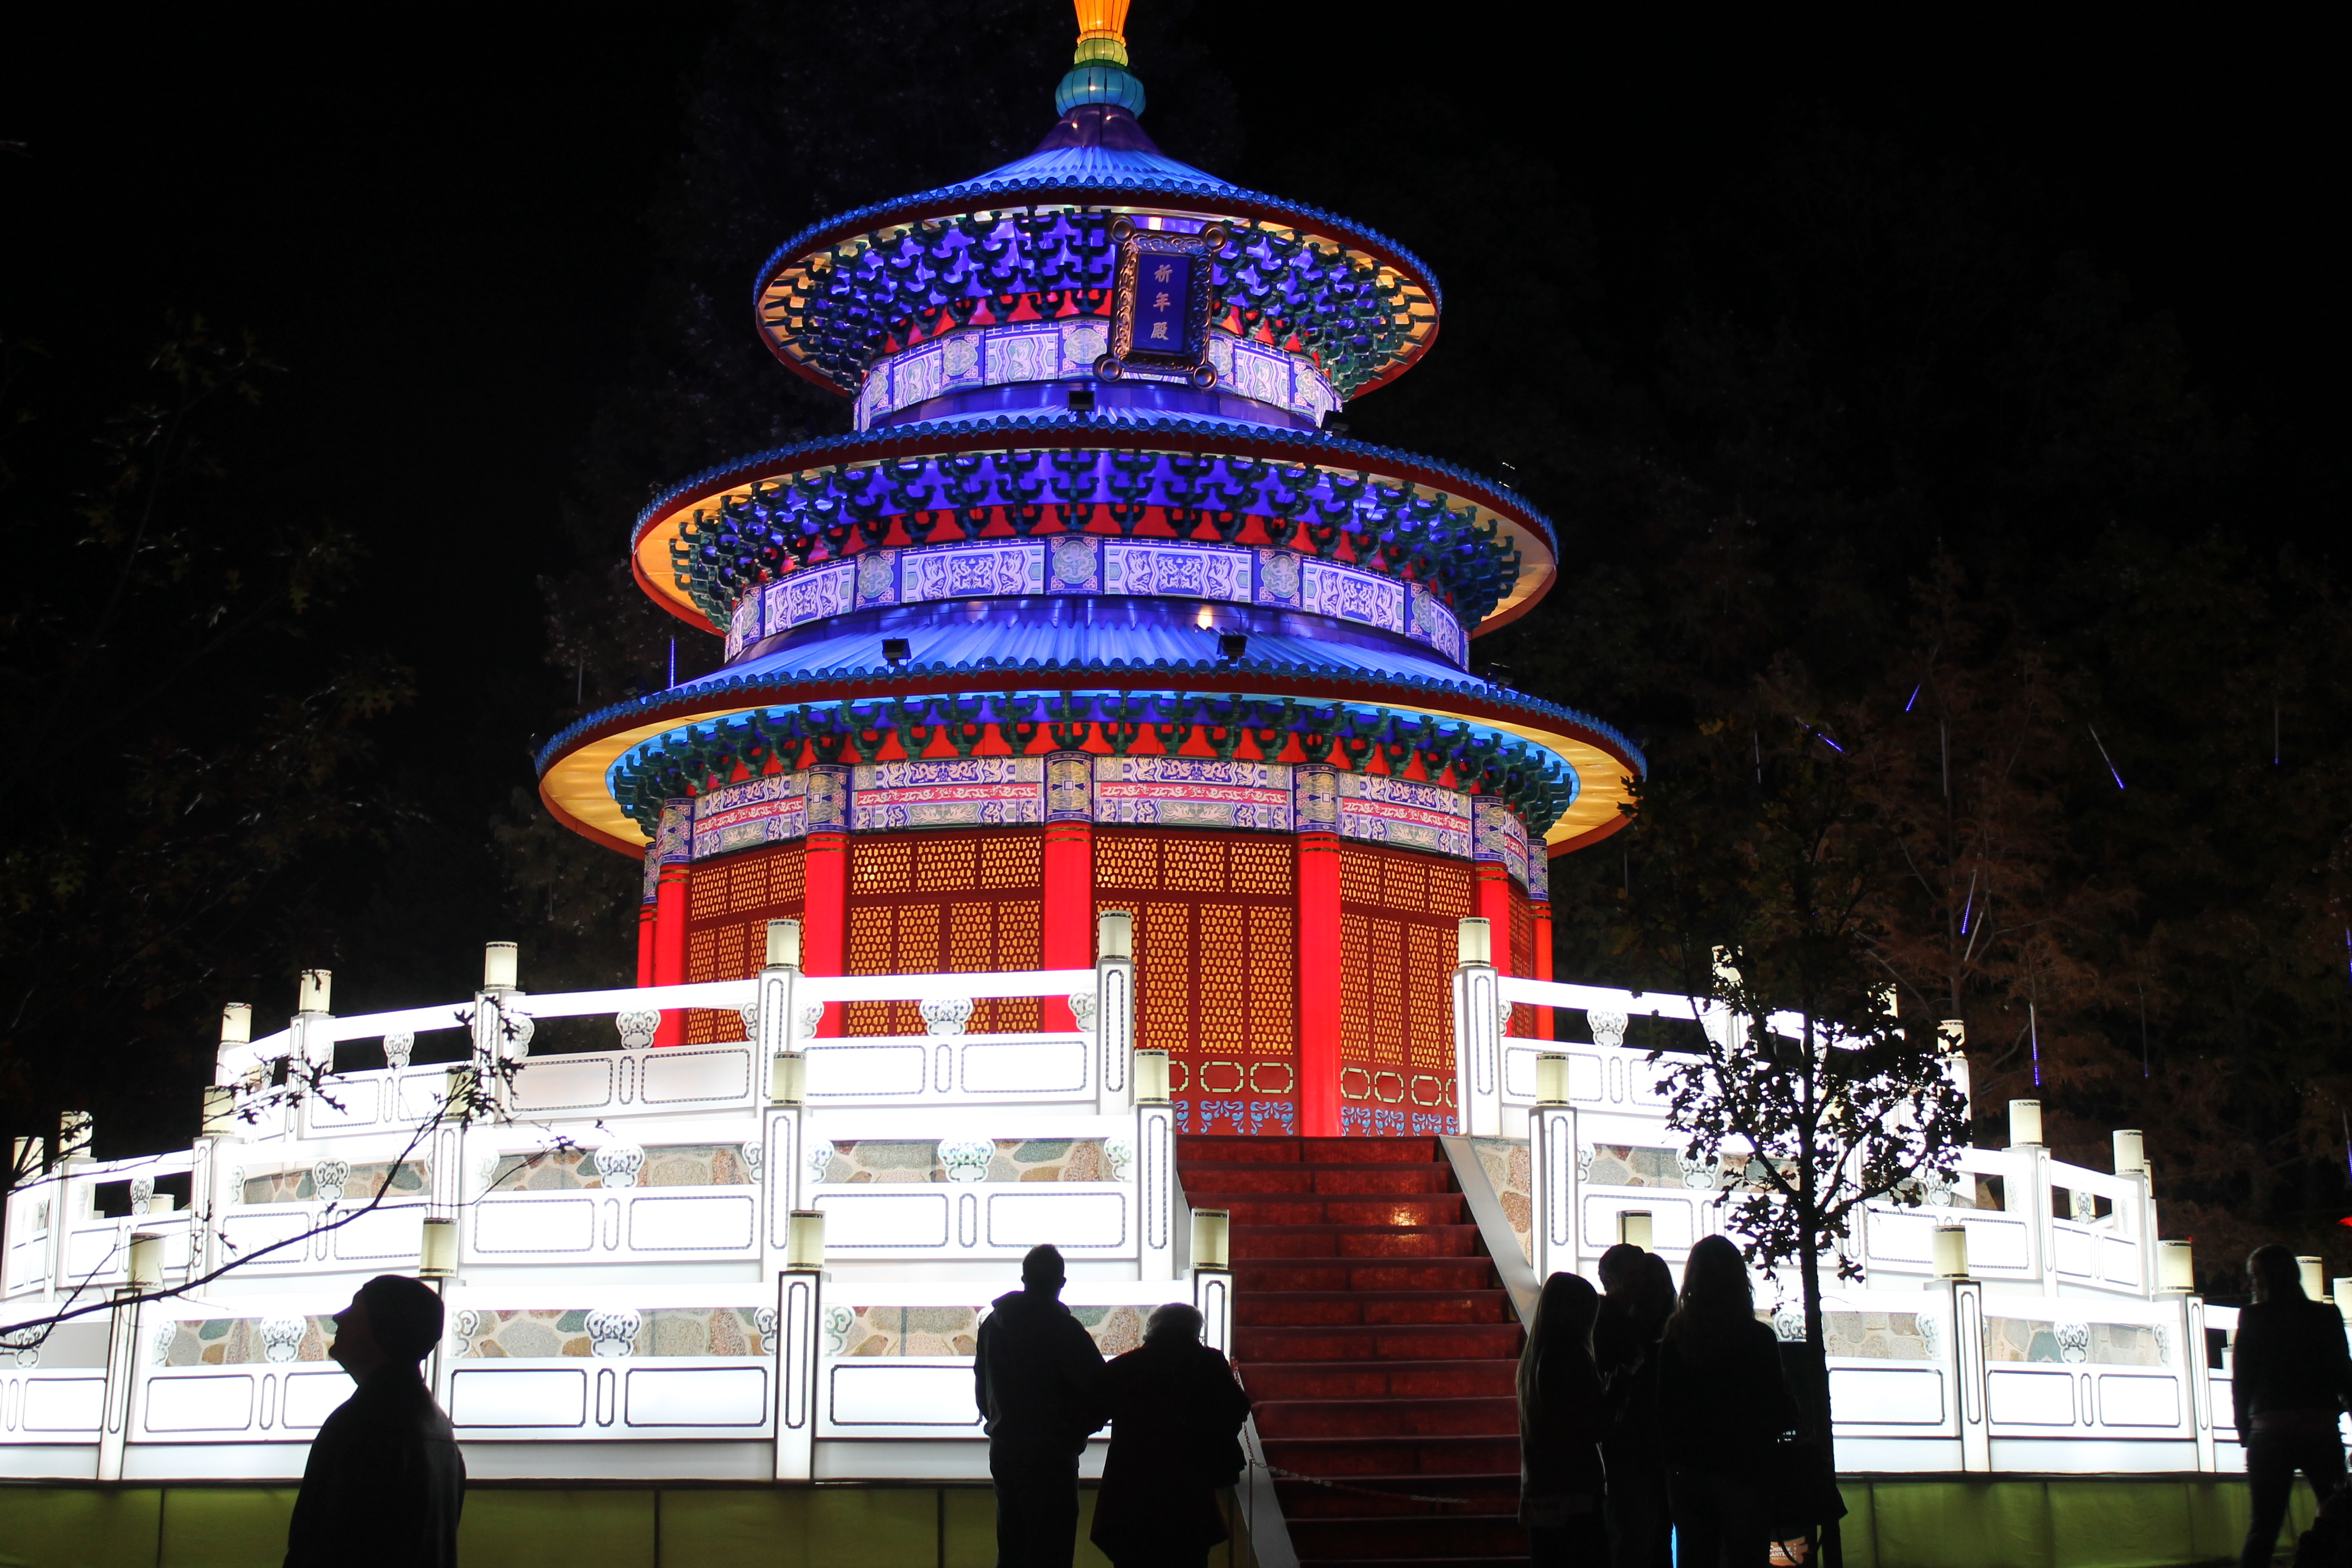 The Chinese Lantern Festival dazzles in Fair Park